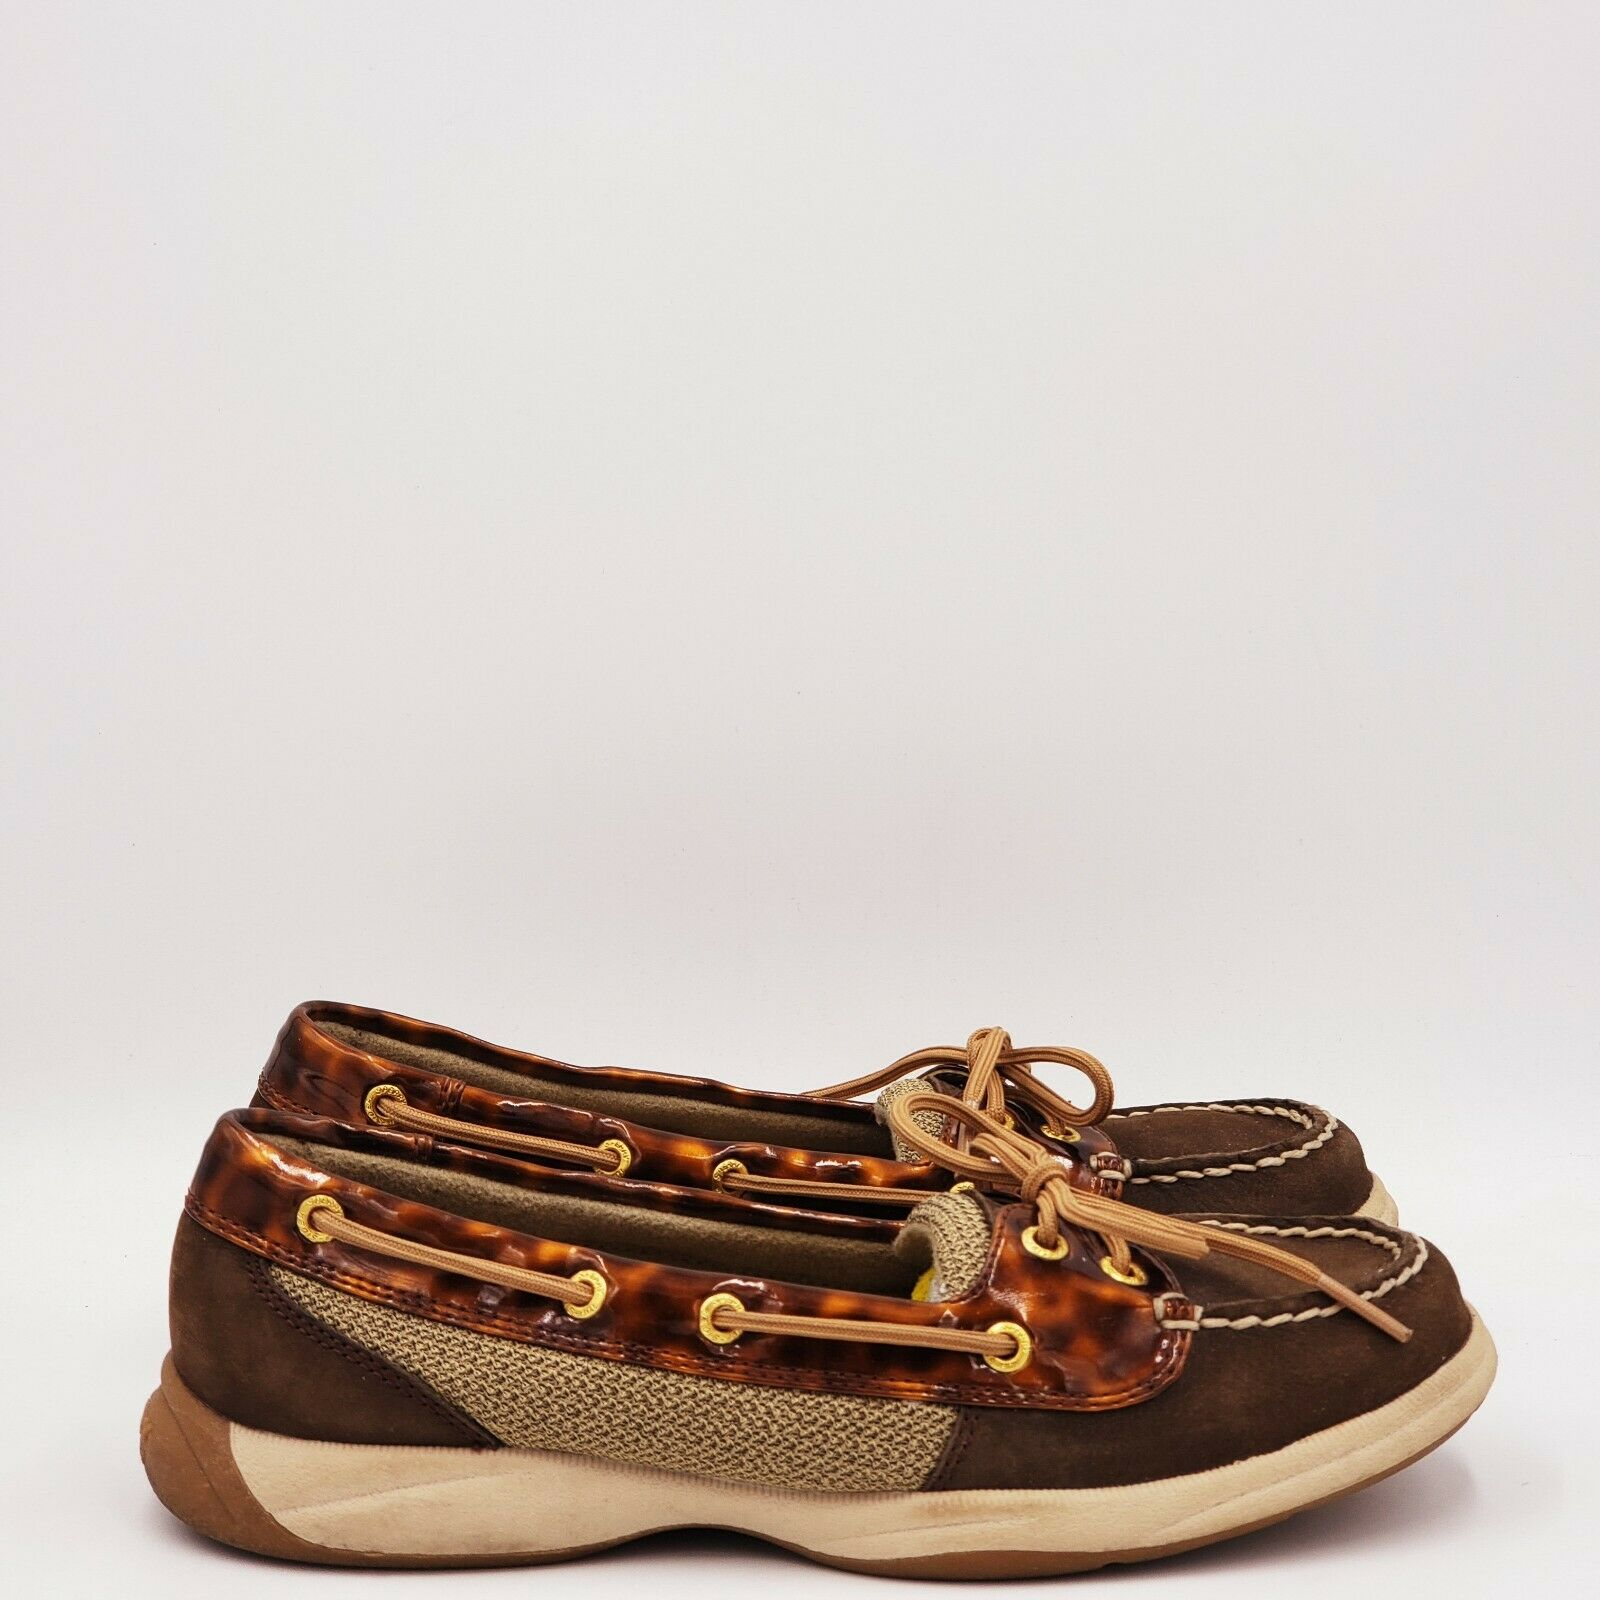 Sperry Women's Laguna Tortoise Brown Boat Shoes Size 7.5 Medium Brown B512